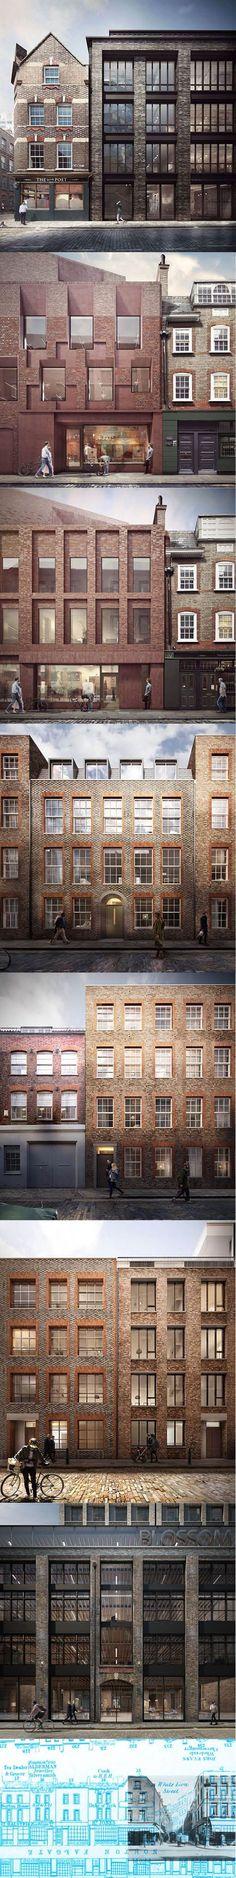 2015 Duggan Morris - Blossom Street / concept / London UK / brick / AHMM / Forbes Massie / concept: